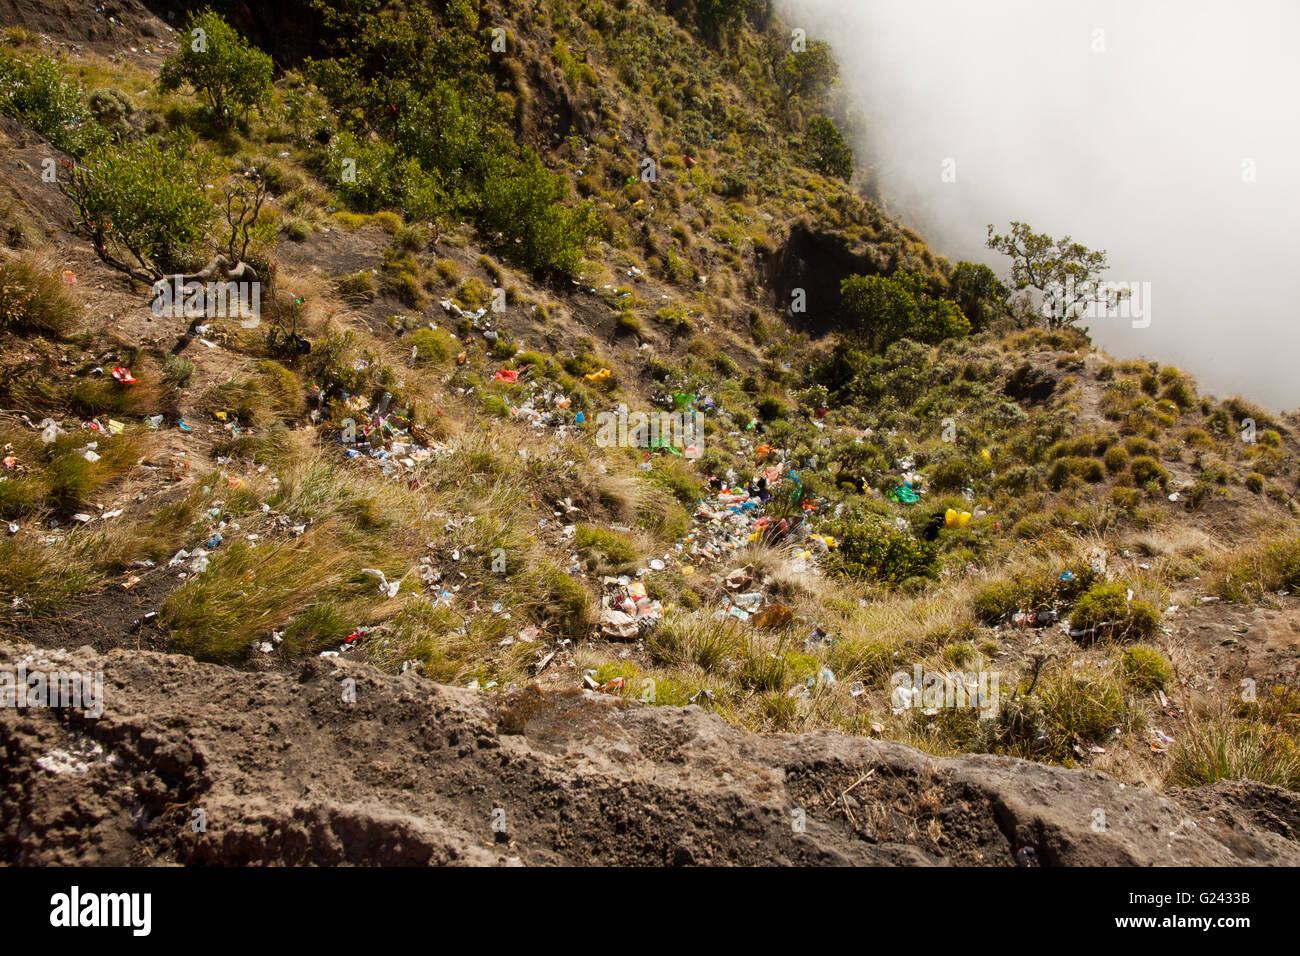 Rinjani Trash Problem, Lombok, Indonesia - Stock Image